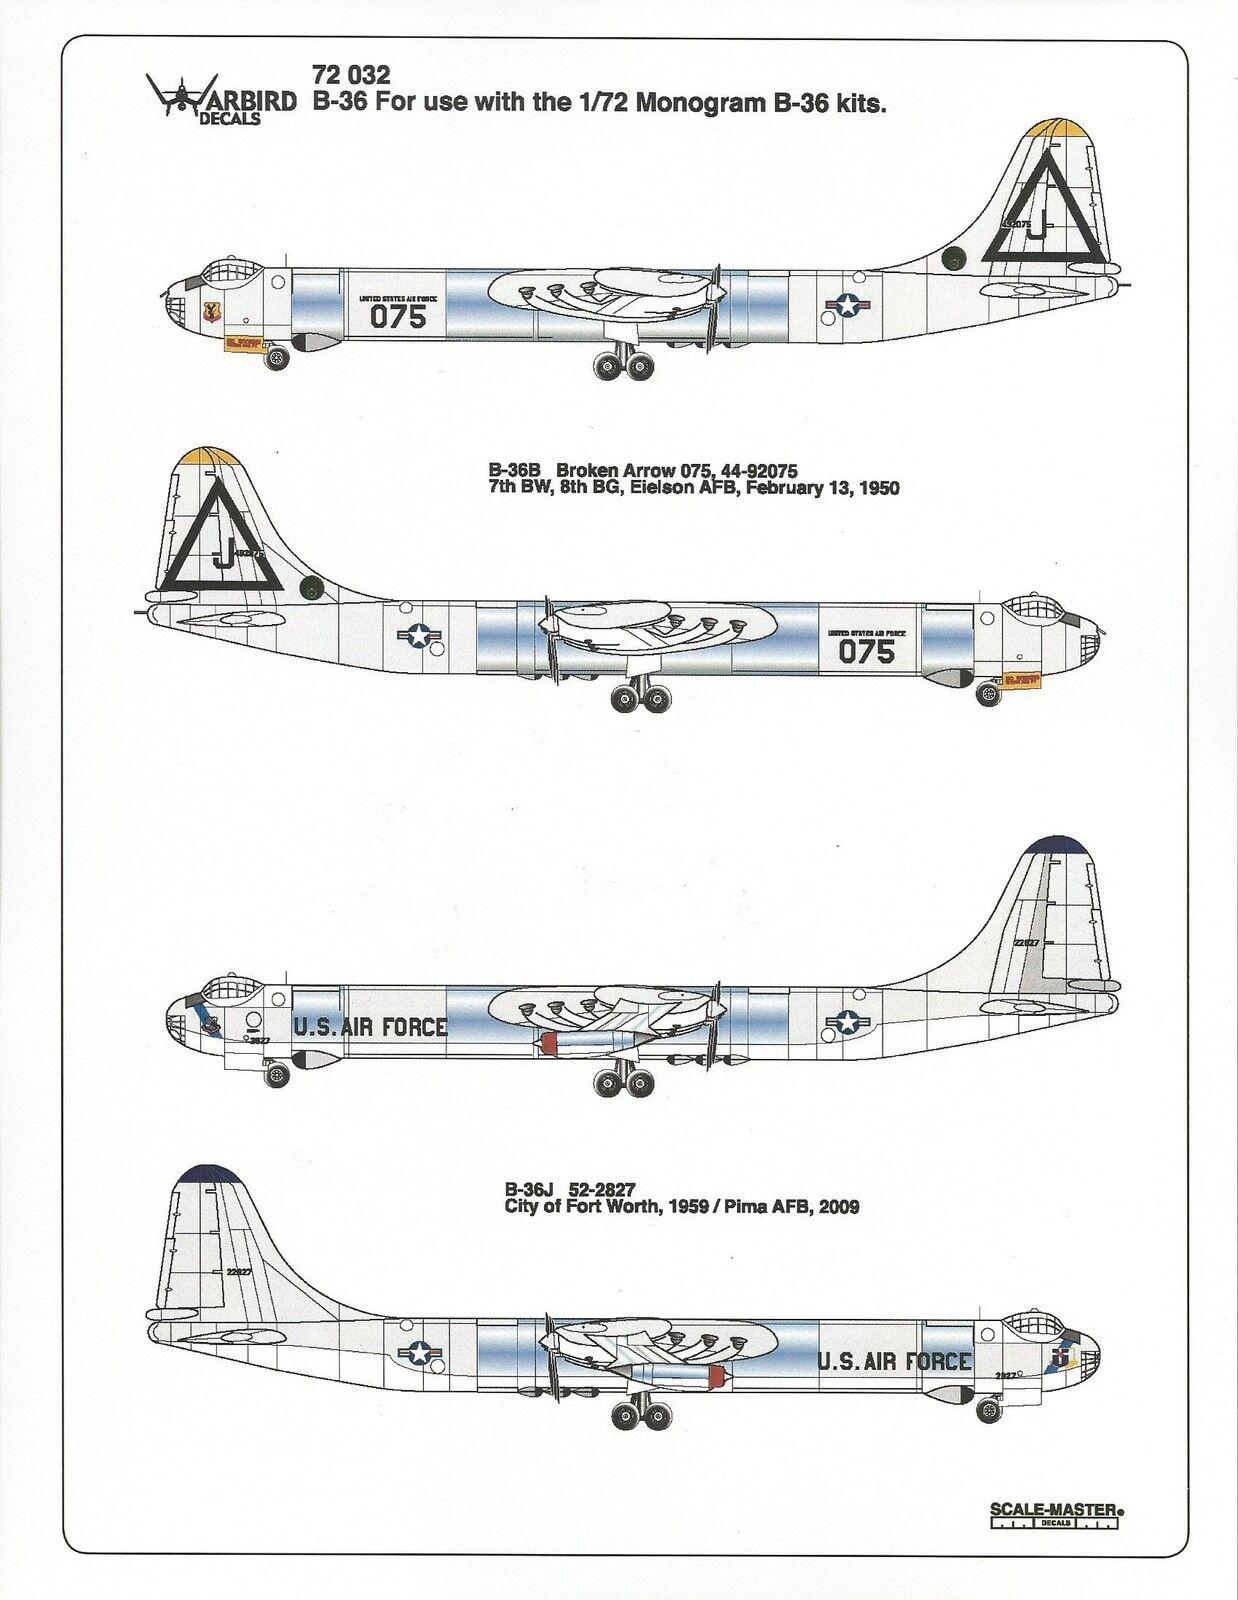 Warbird B-36 Peacemaker (Hacedor de Paz ) , Broken ARROW Barco 075 Set Adhesivos